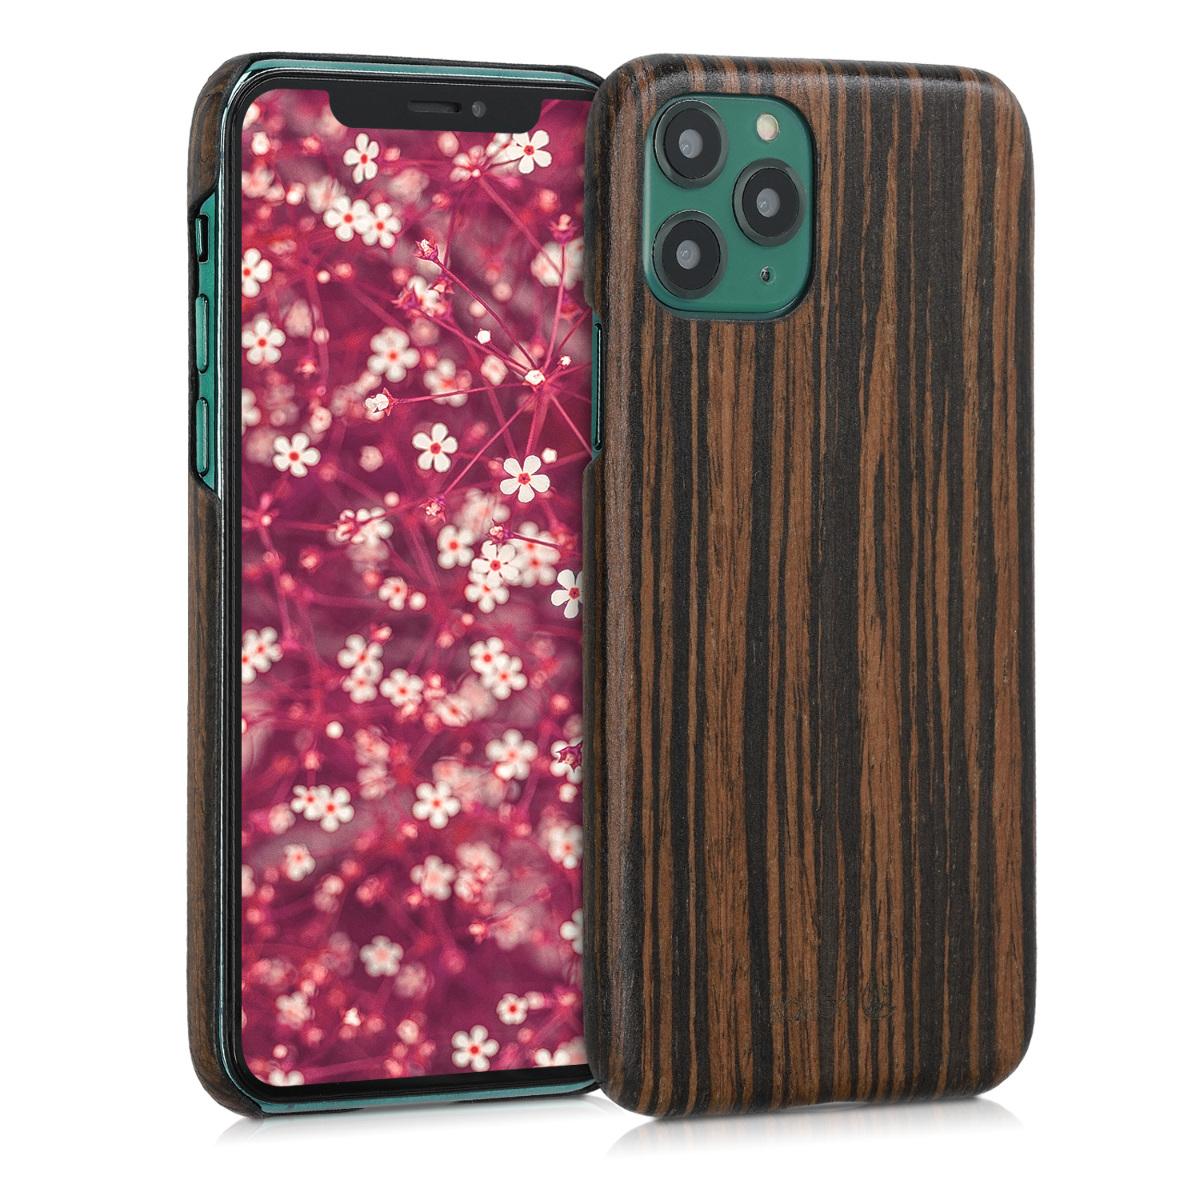 Kalibri Σκληρή Ξύλινη Θήκη iPhone 11 Pro - Dark Brown (49795.18)